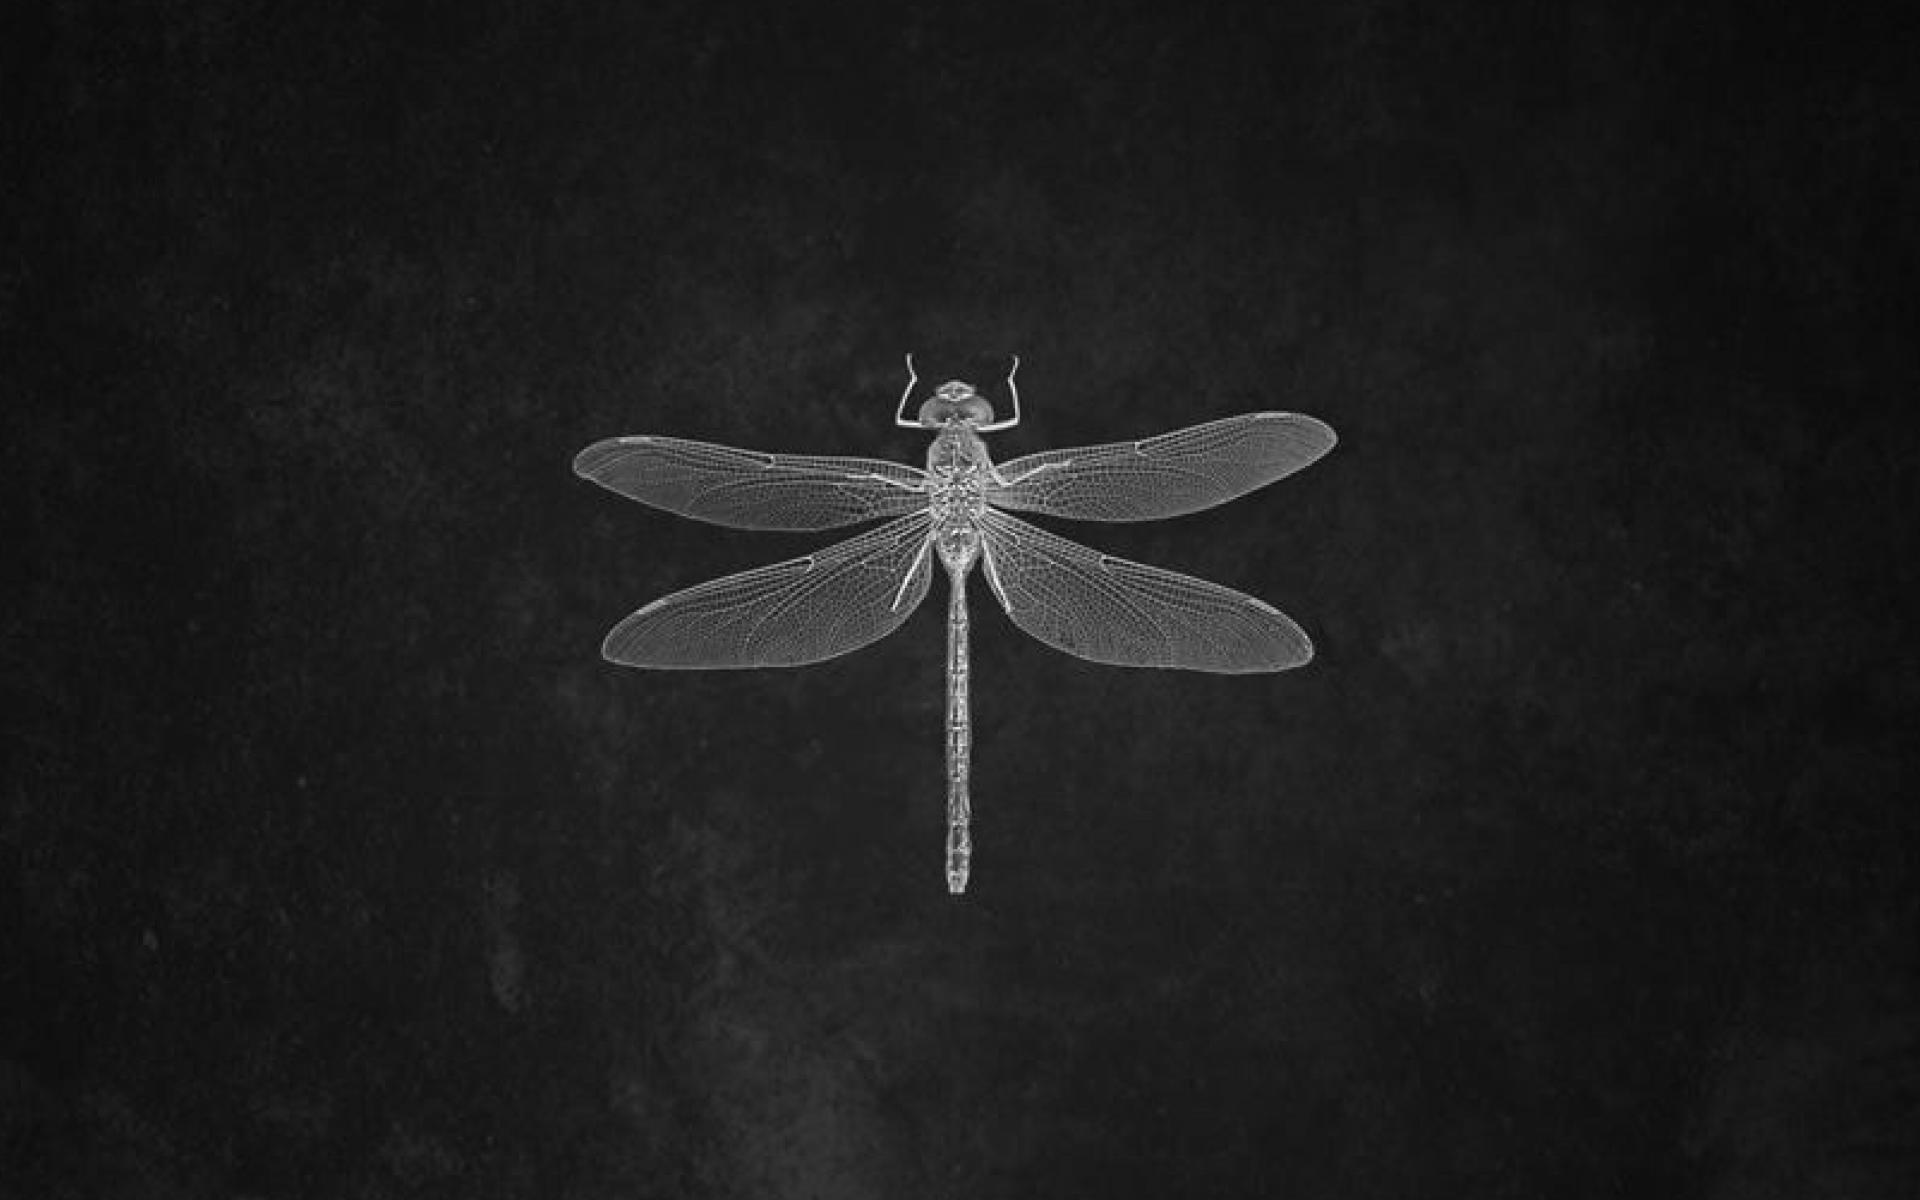 OLSEN Alone Feat. Nat Conway - OLSEN